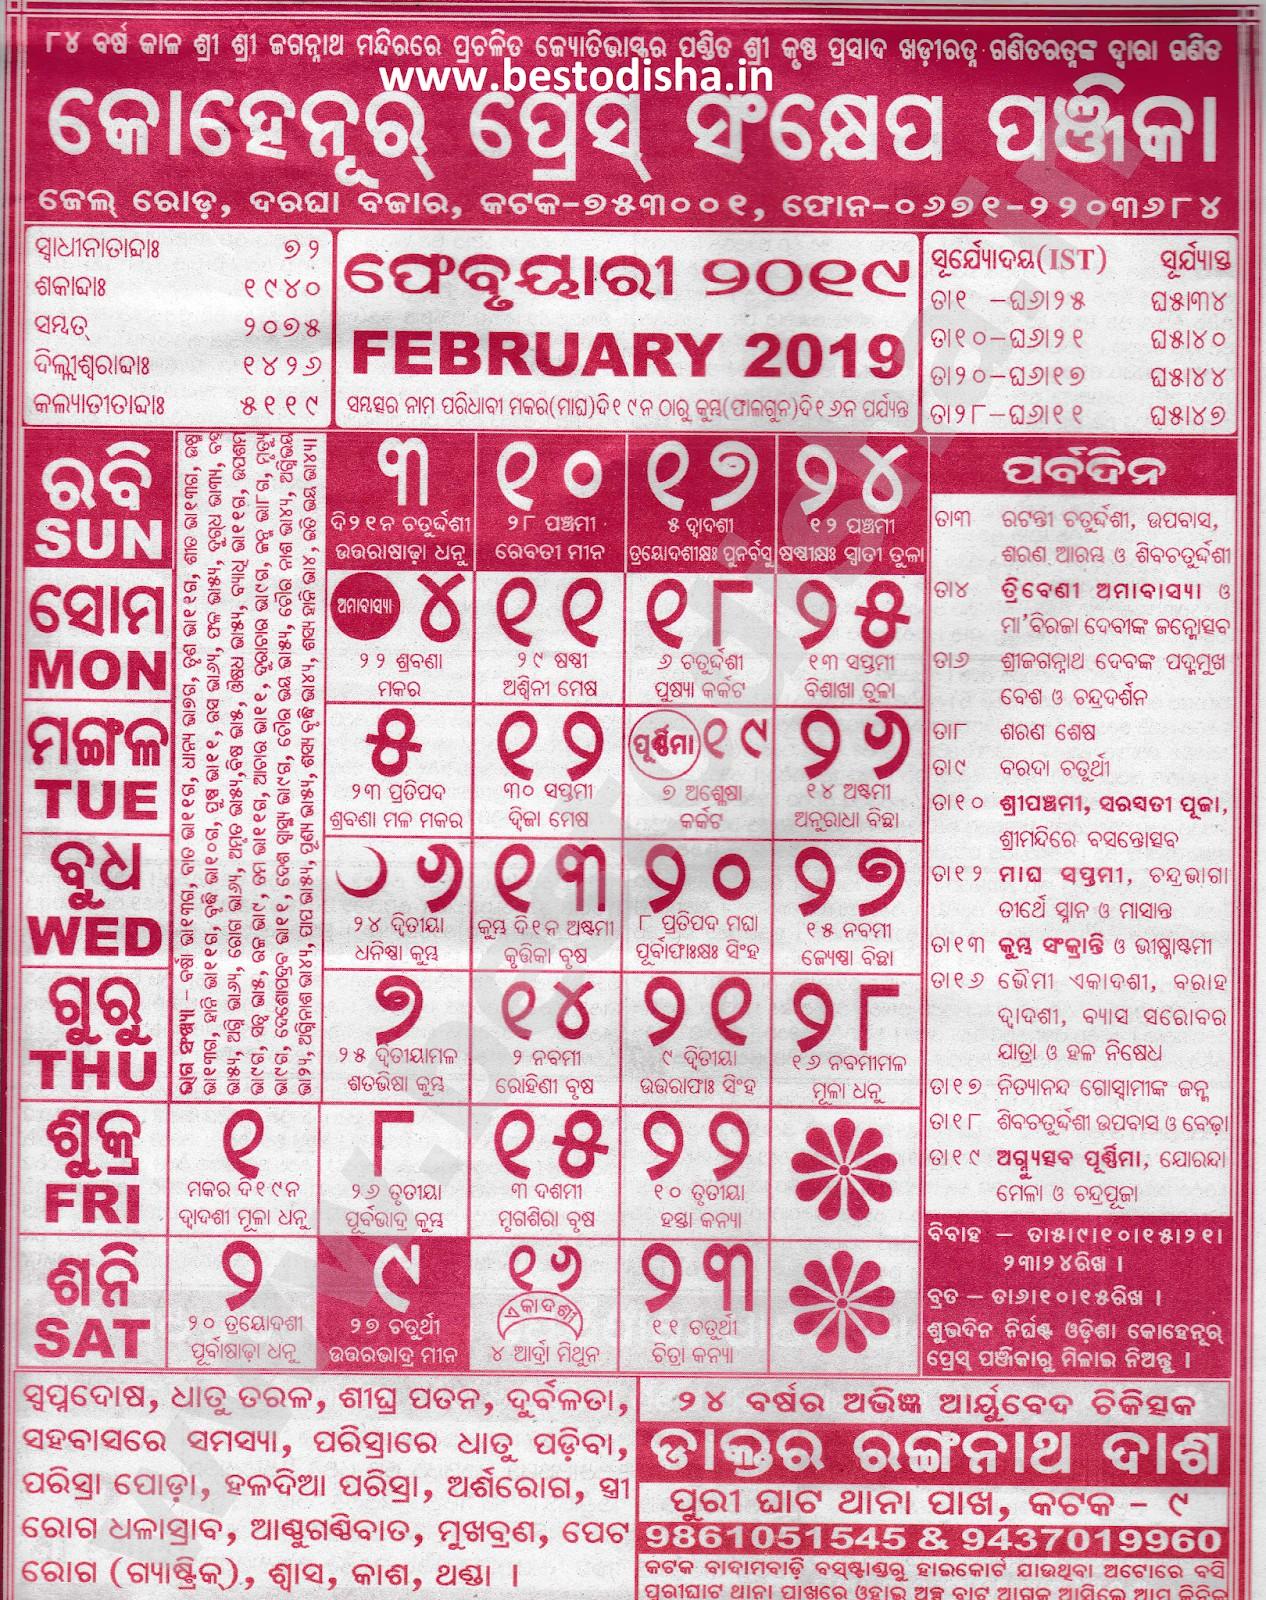 kohinoor odia calendar 2019 pdf here best odisha